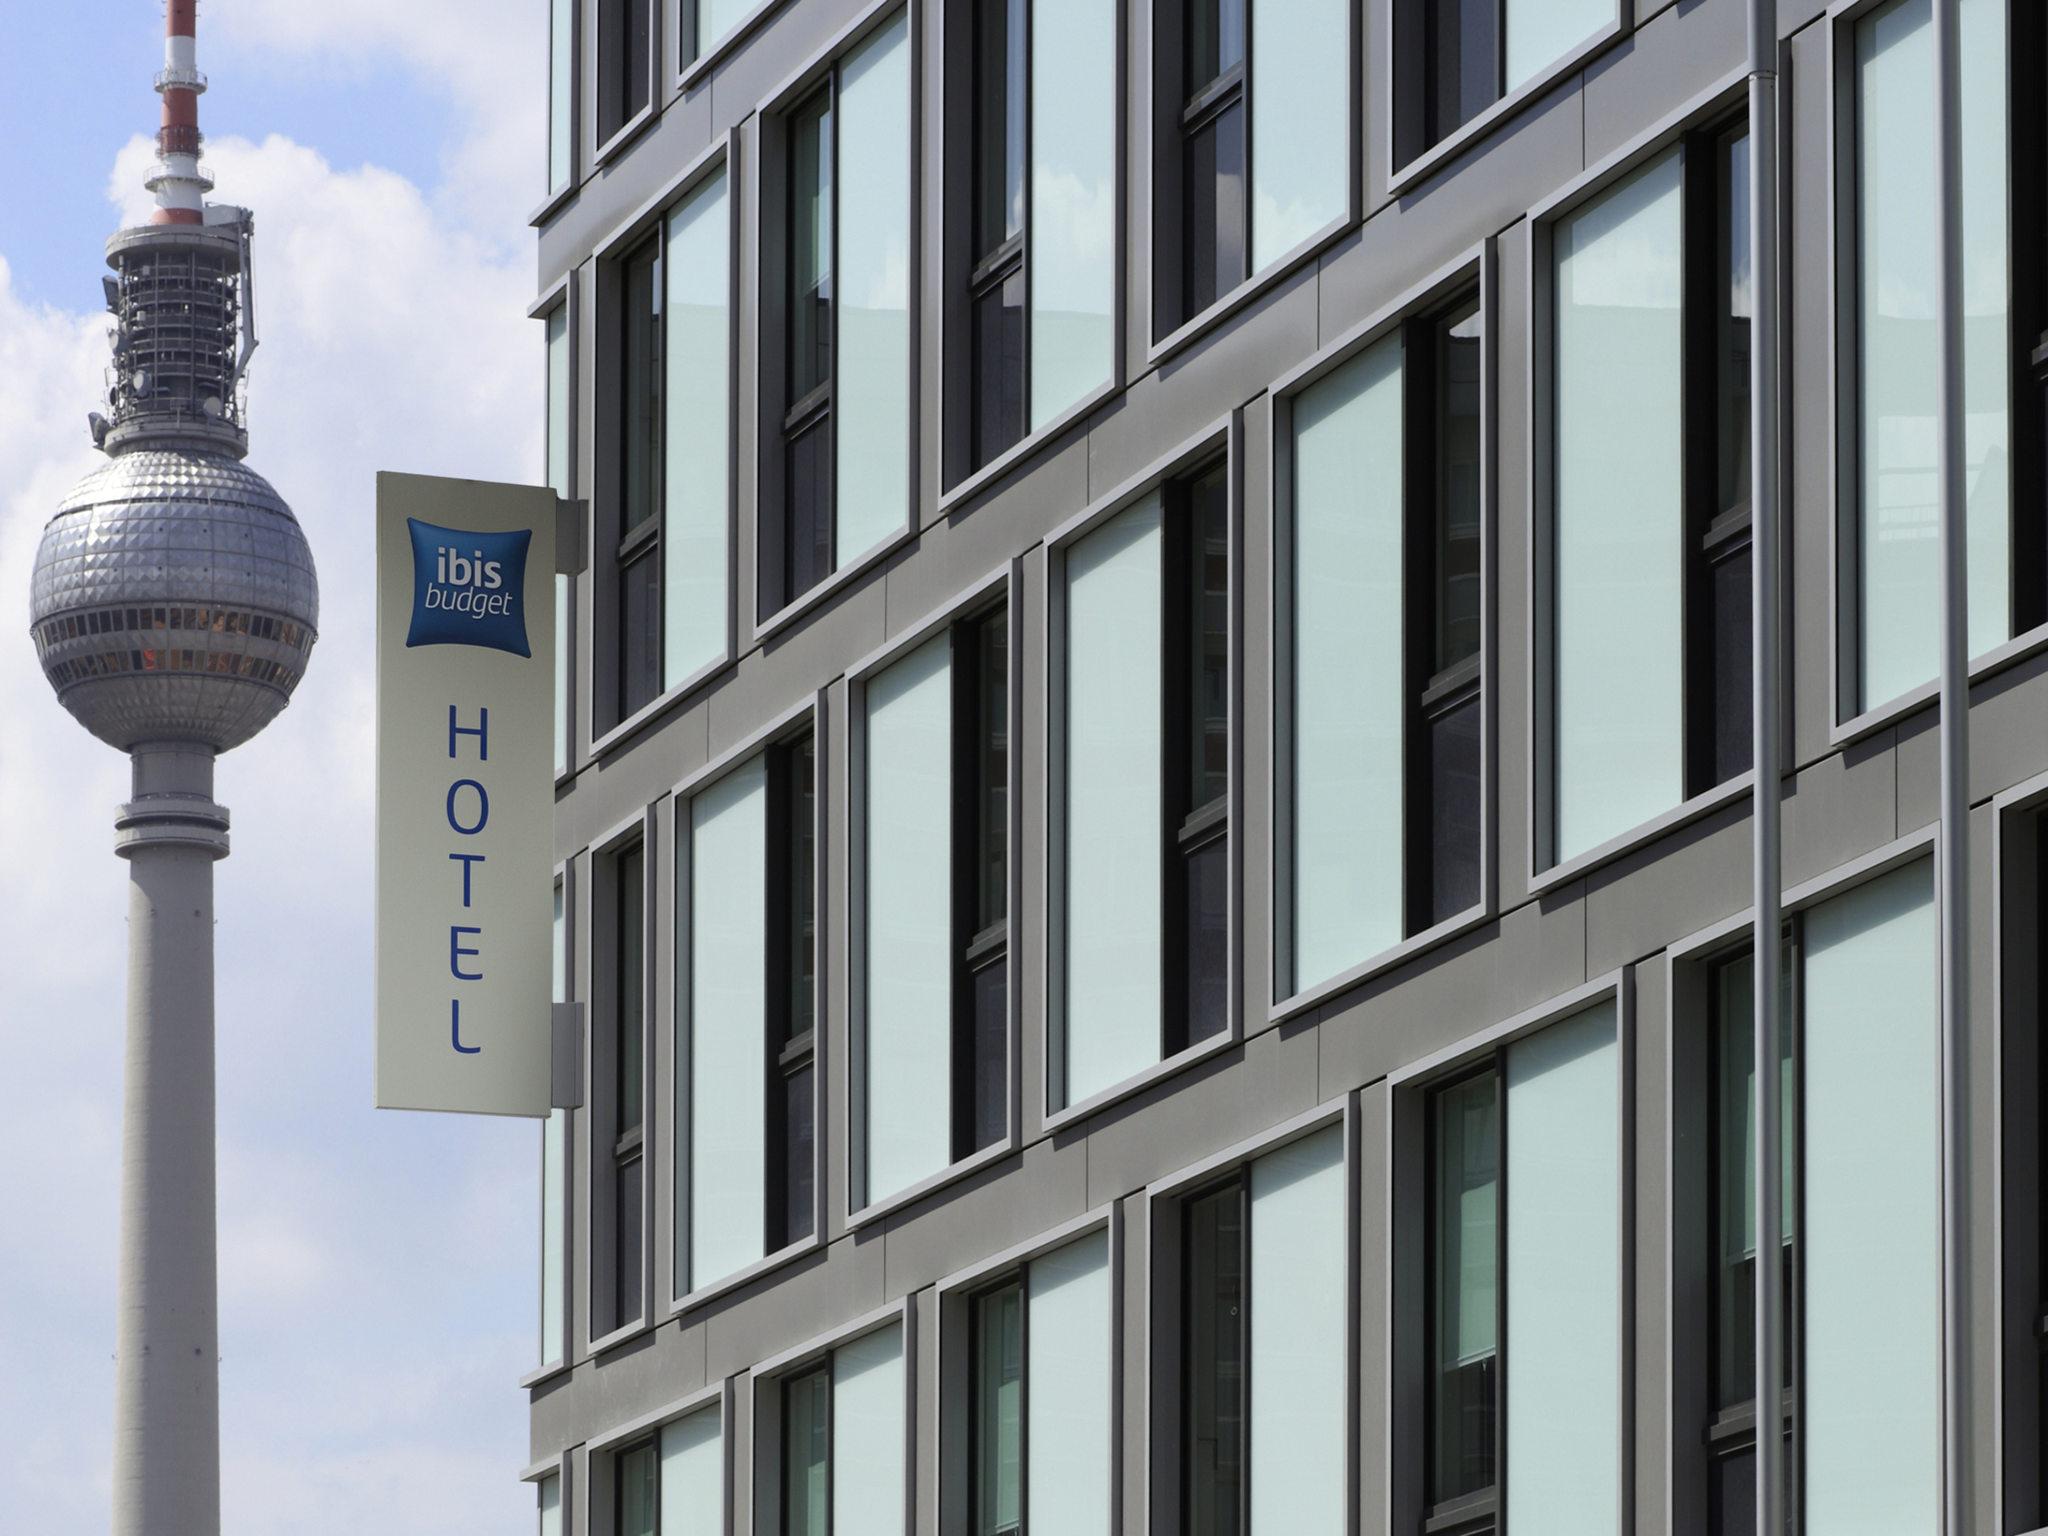 Hotel – ibis budget Berlin Alexanderplatz